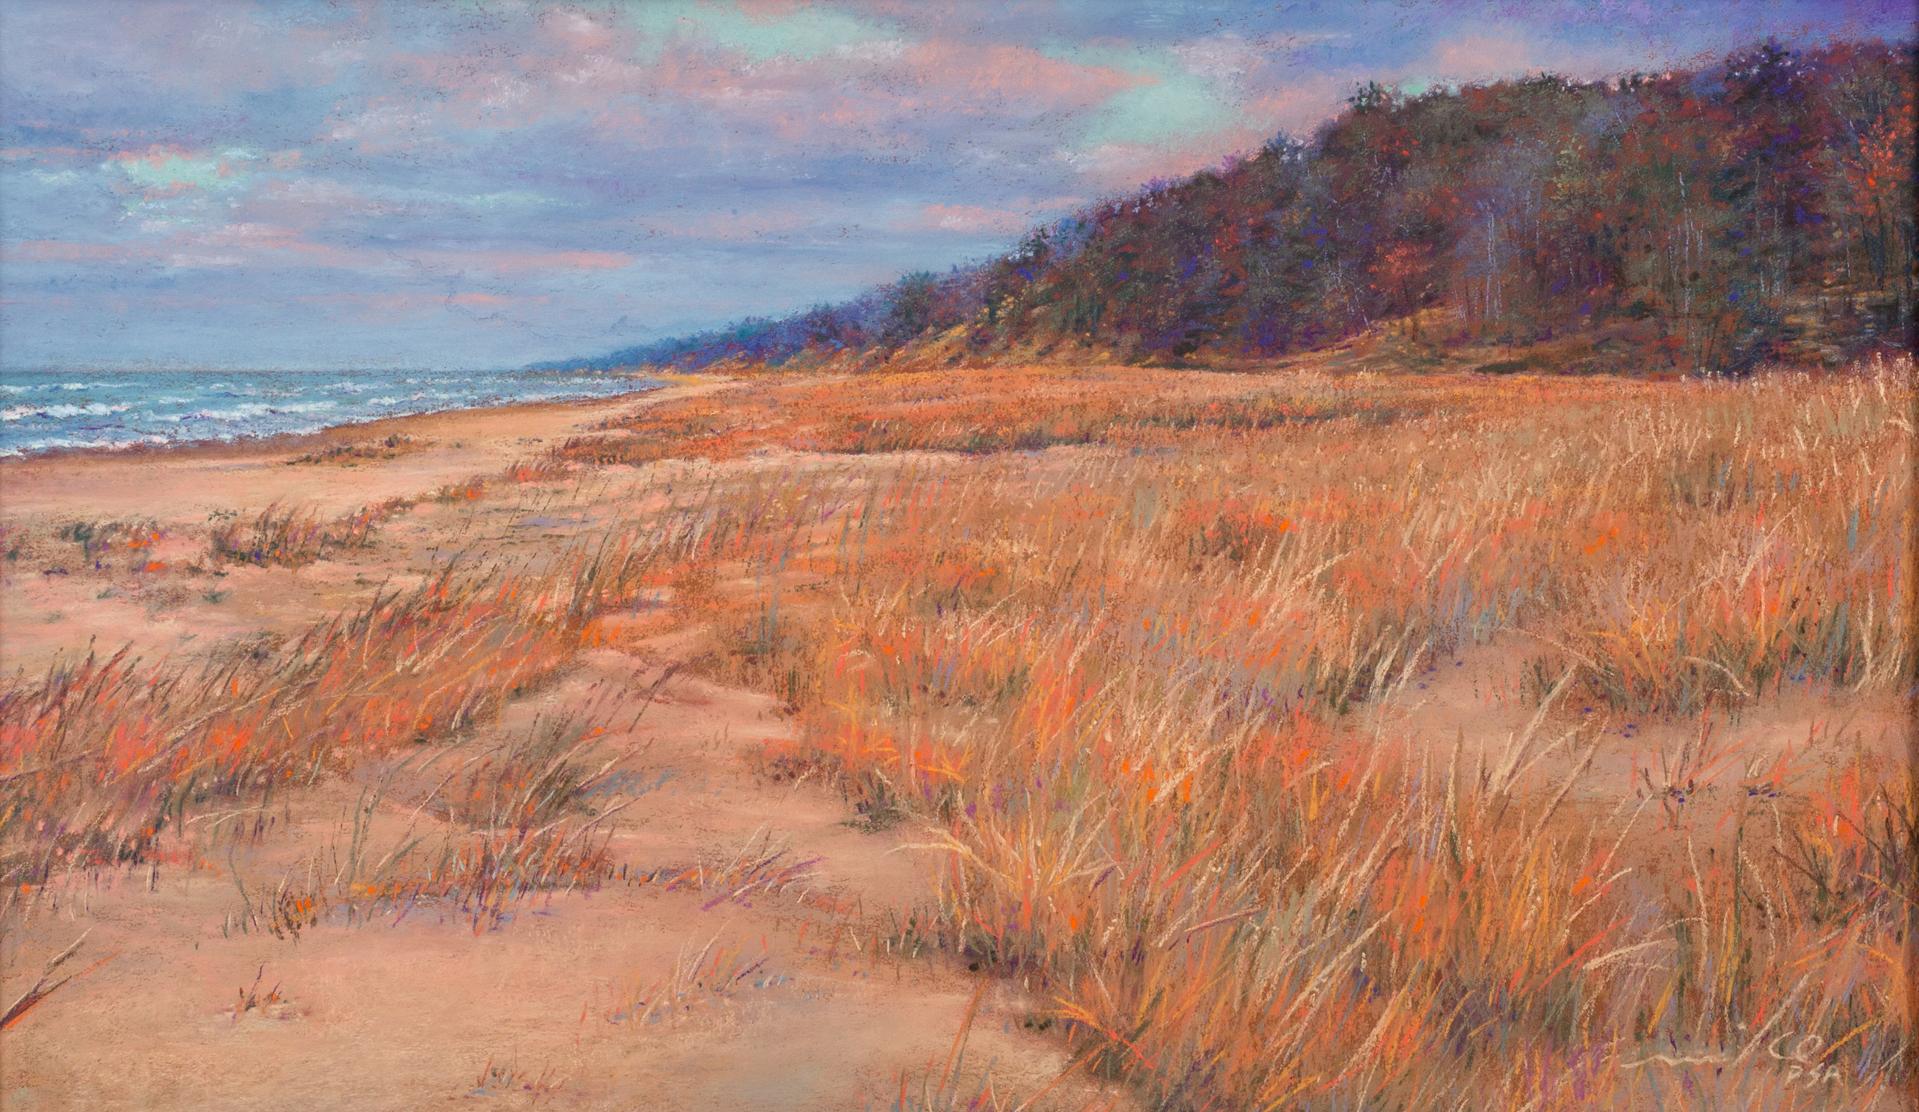 Grass Roots by Mike Barret Kolasinski